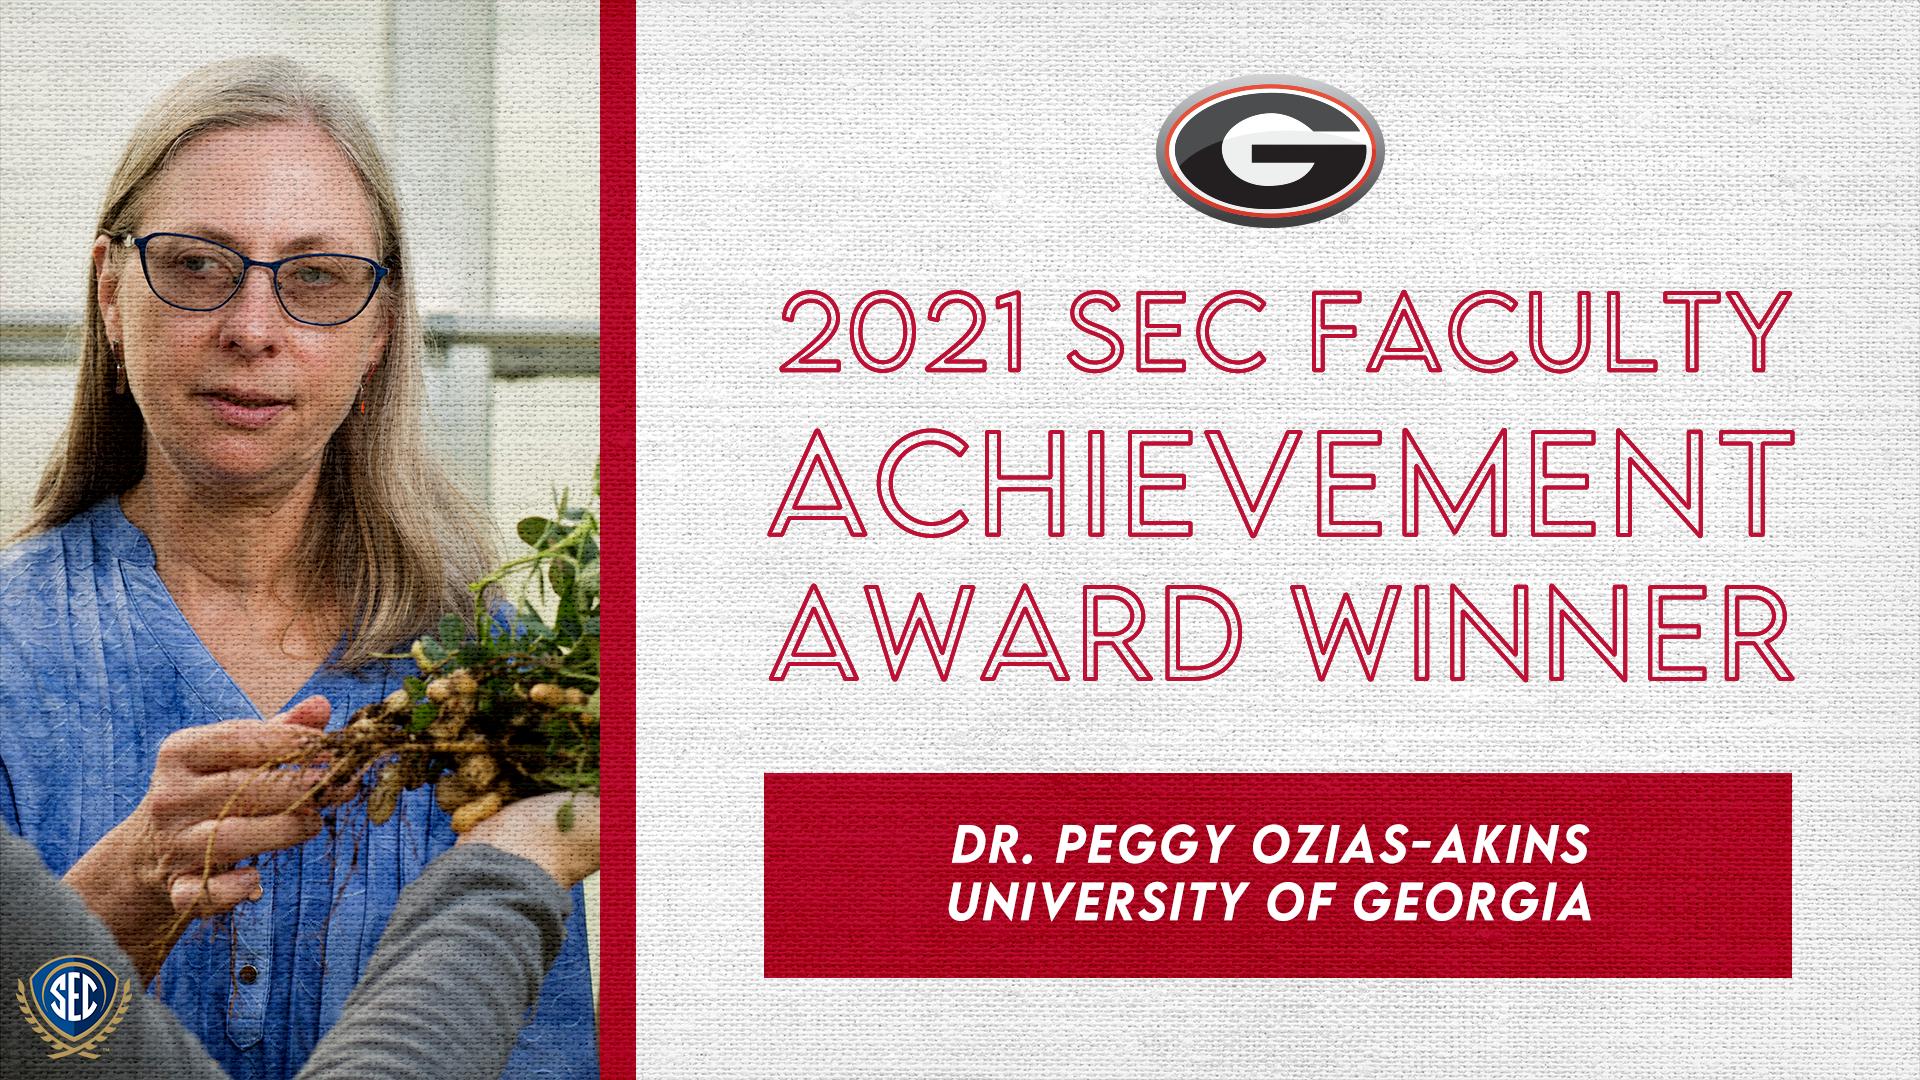 SEC Announces Dr. Peggy Ozias-Akins Wins 2021 Faculty Achievement Award for University of Georgia